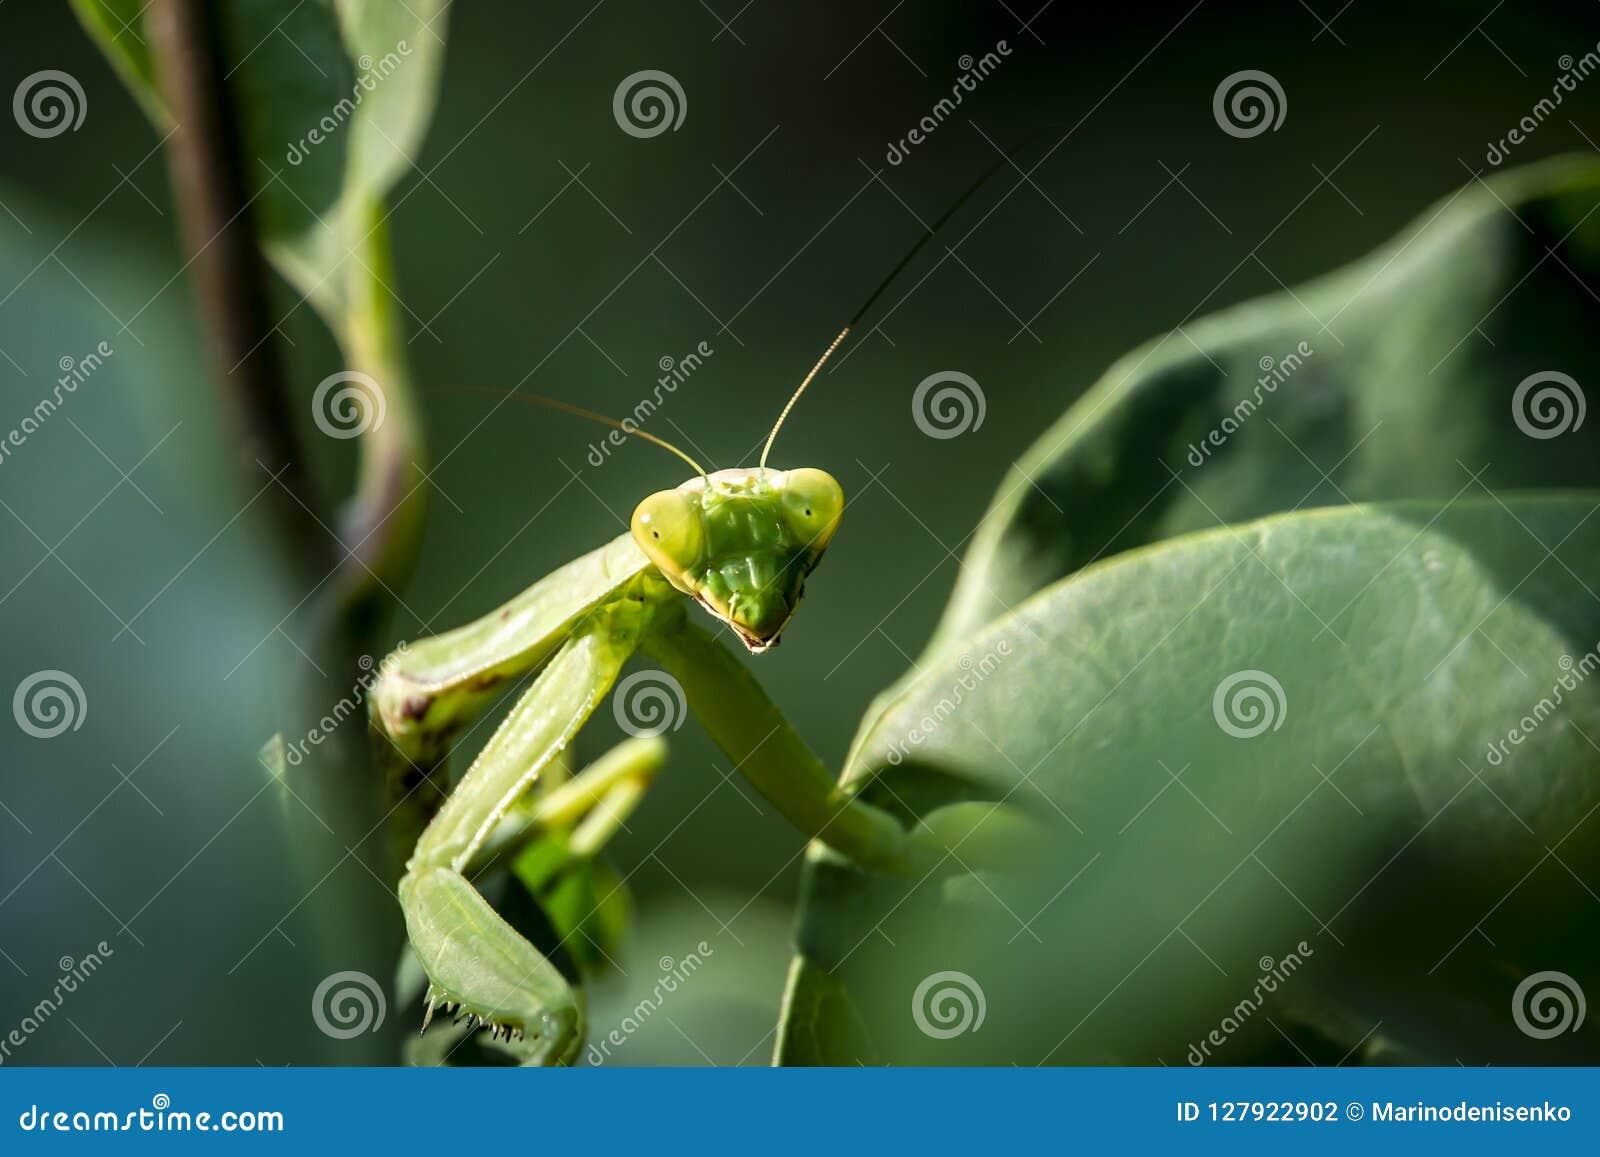 Macro Of Pregnant Female Praying Mantis Or Mantis Religiosa In A